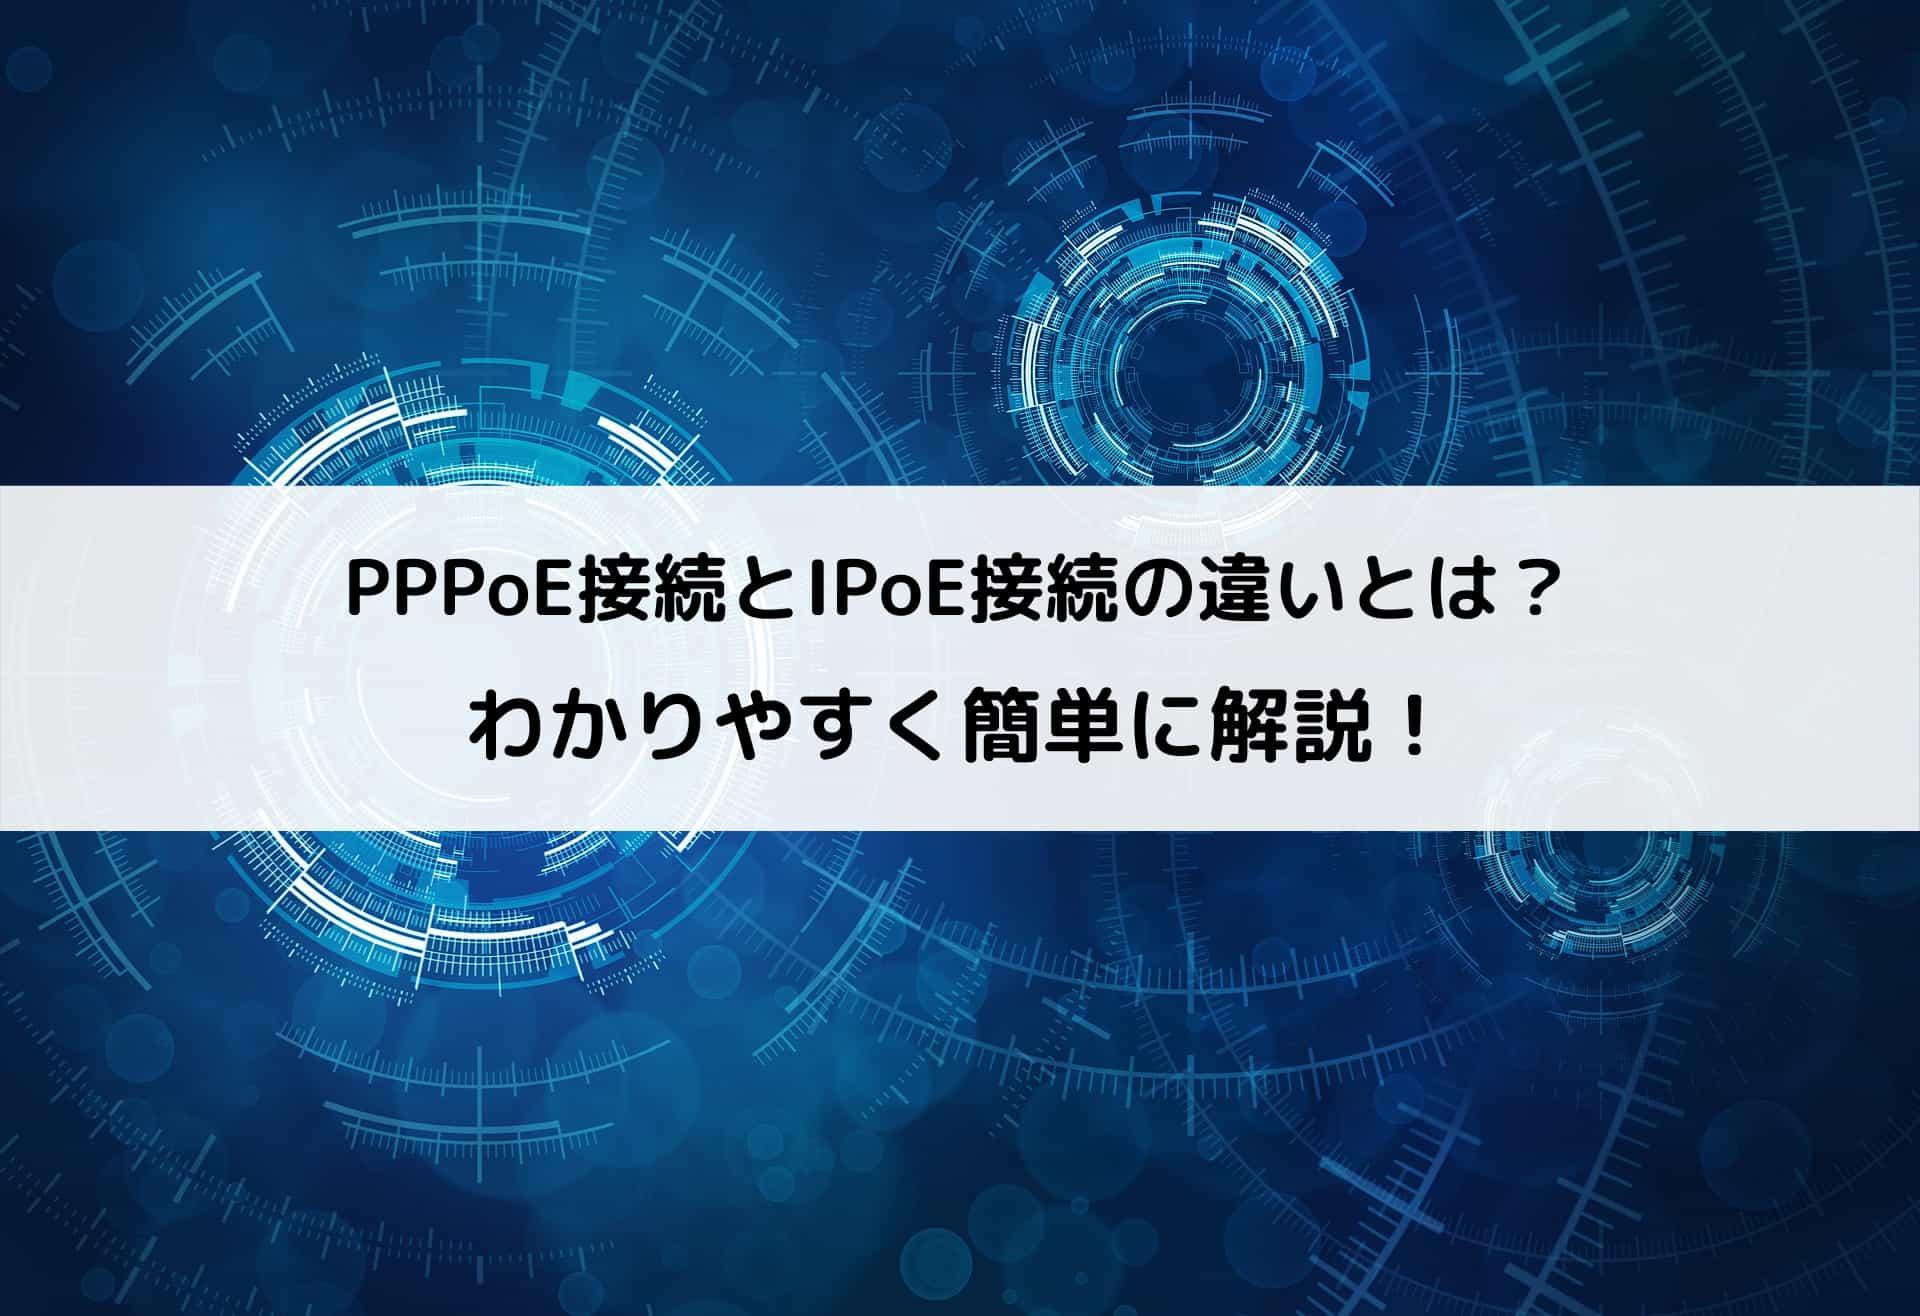 PPPoE接続とIPoE接続の違いとは?わかりやすく簡単に解説!